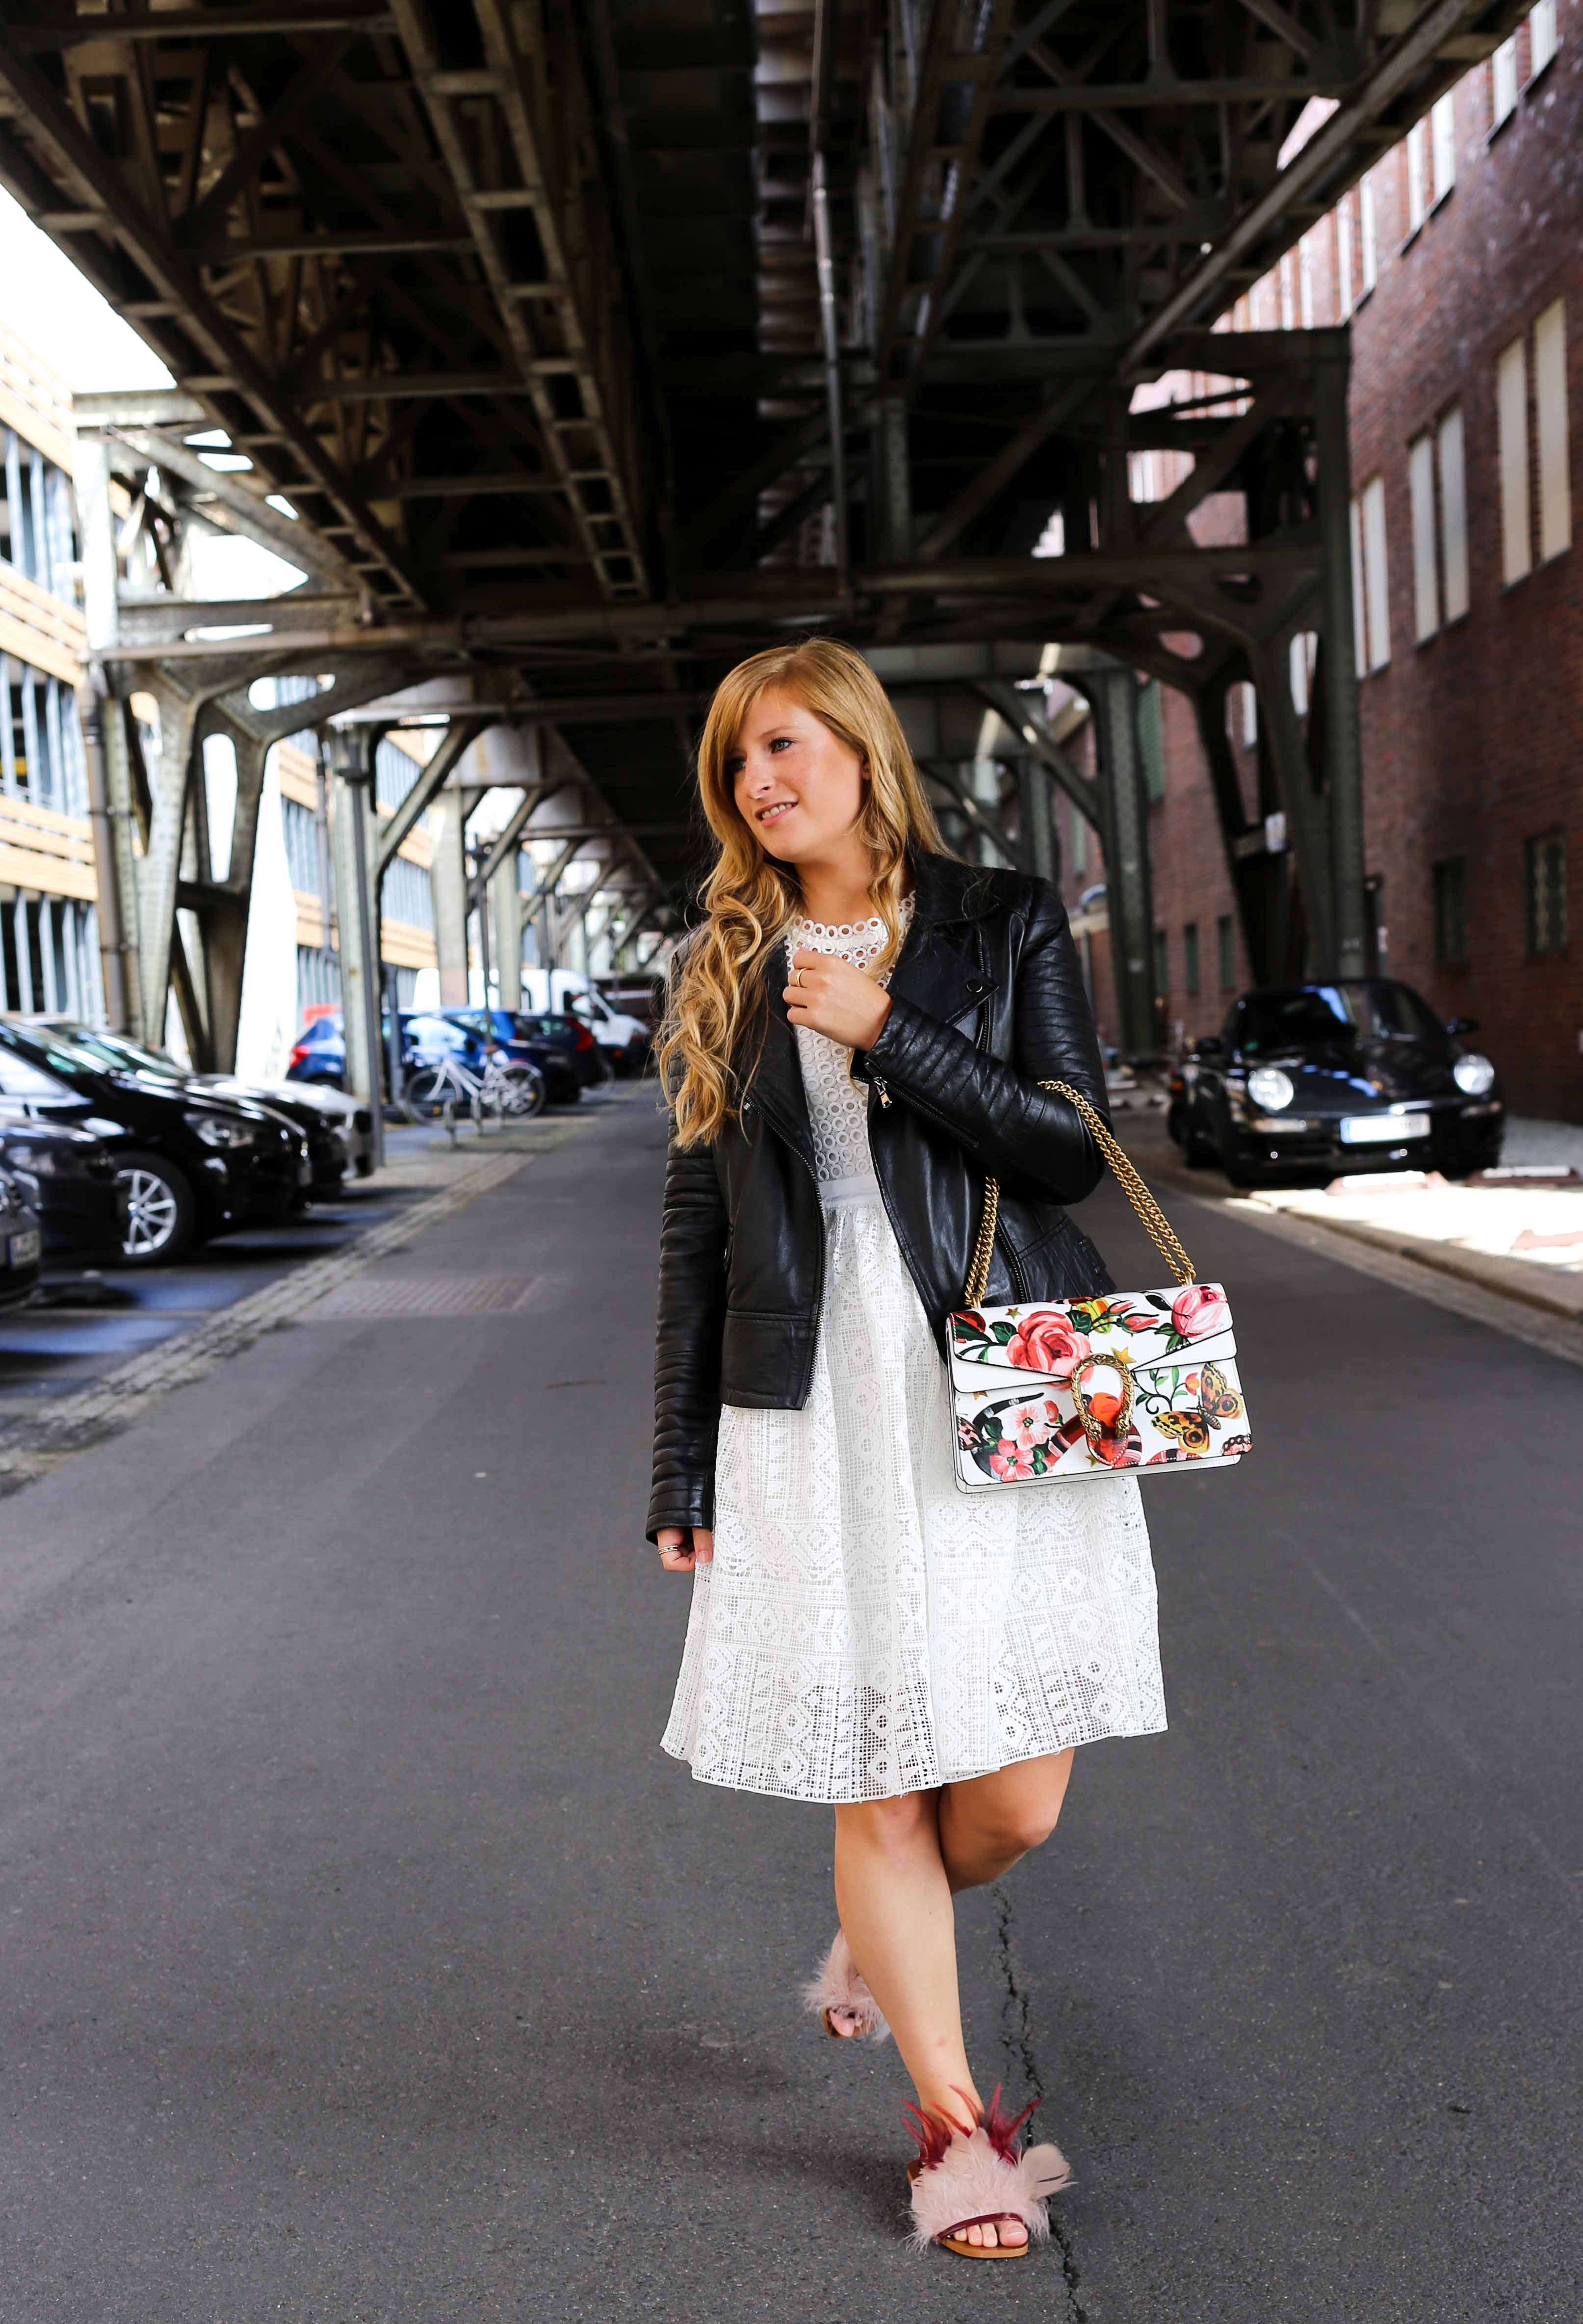 Fashion Week Outfit weißes Spitzenkleid Asos flache Ledersandalen mit Federn kombinieren Lederjacke Modeblog Deutschland Fashion Blogger OOTD 1